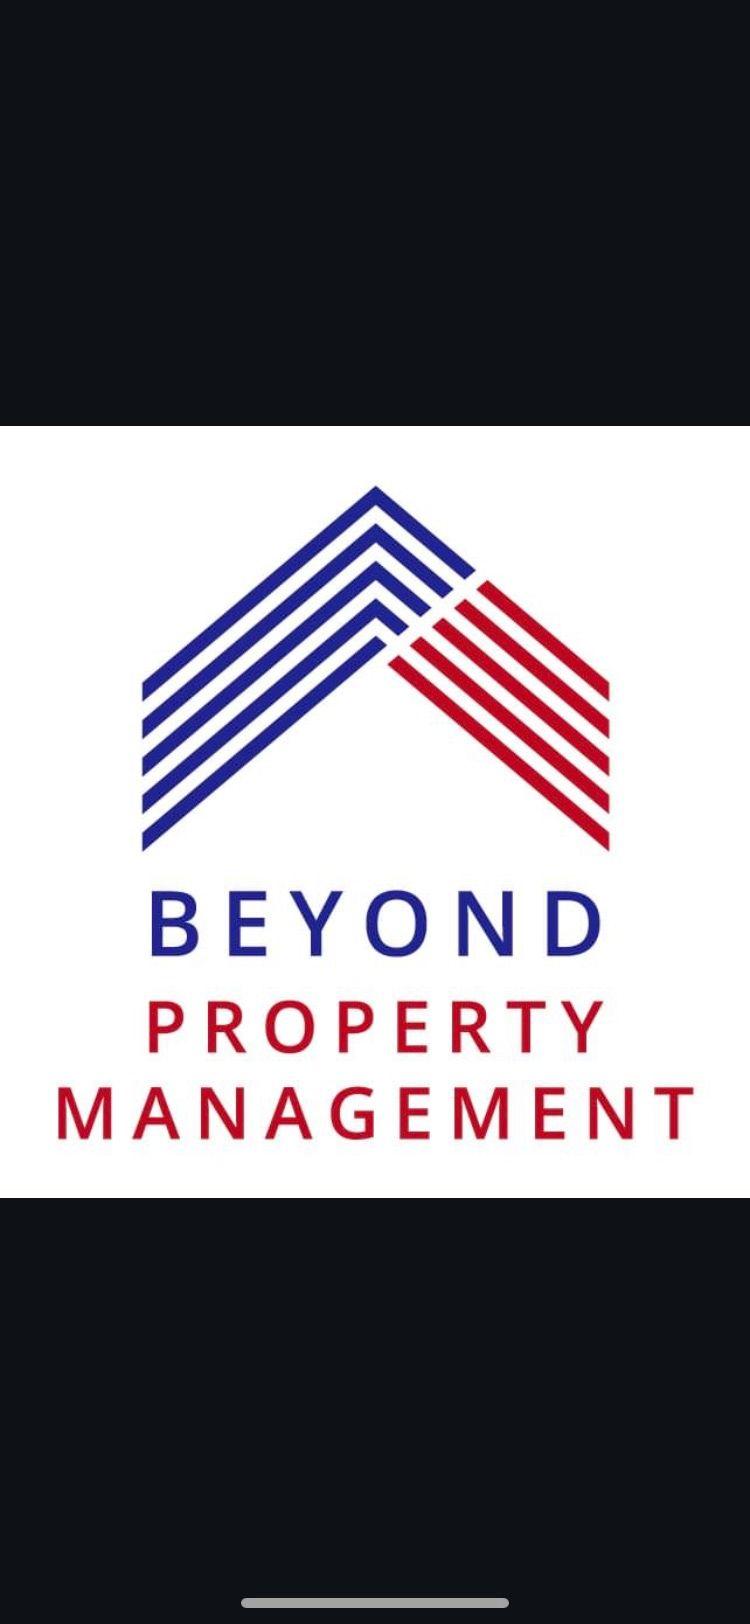 Beyond Property Management